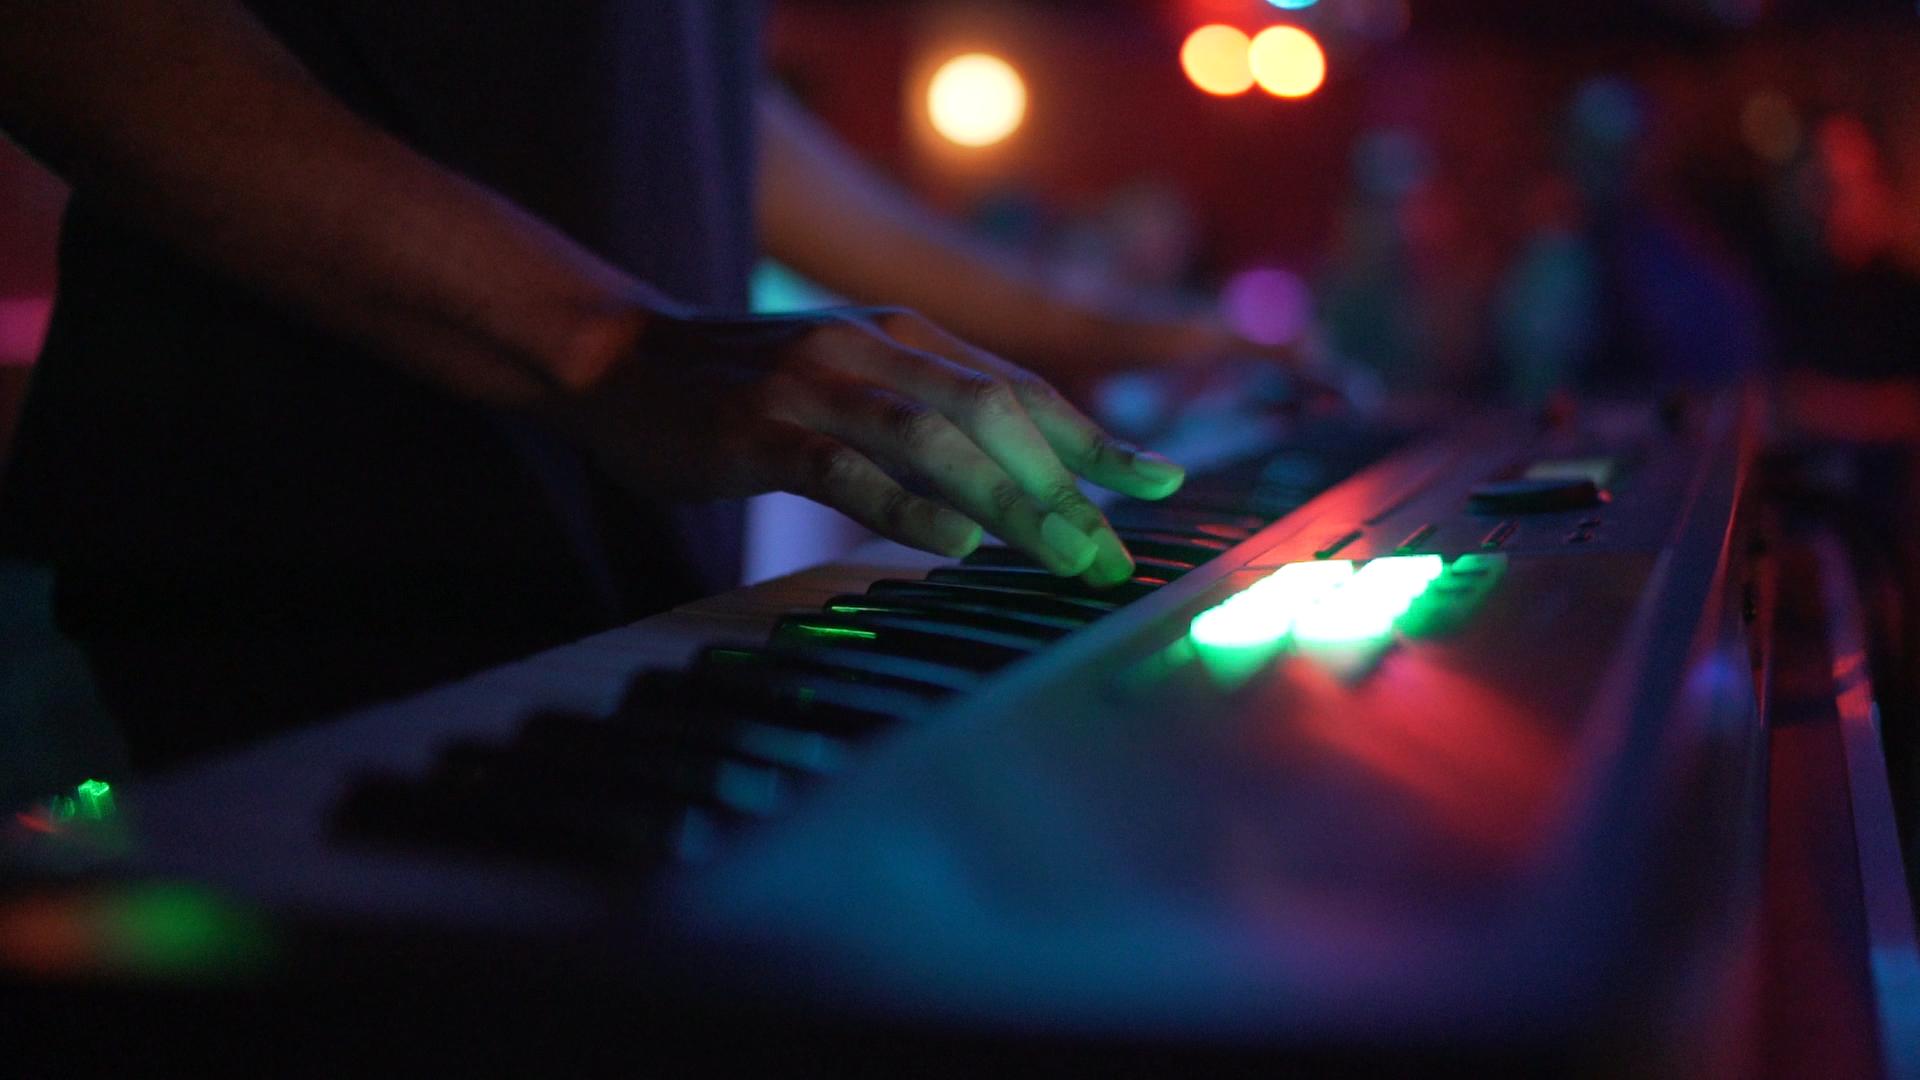 lucky-you-lounge-keyboard-player-spokane-washington